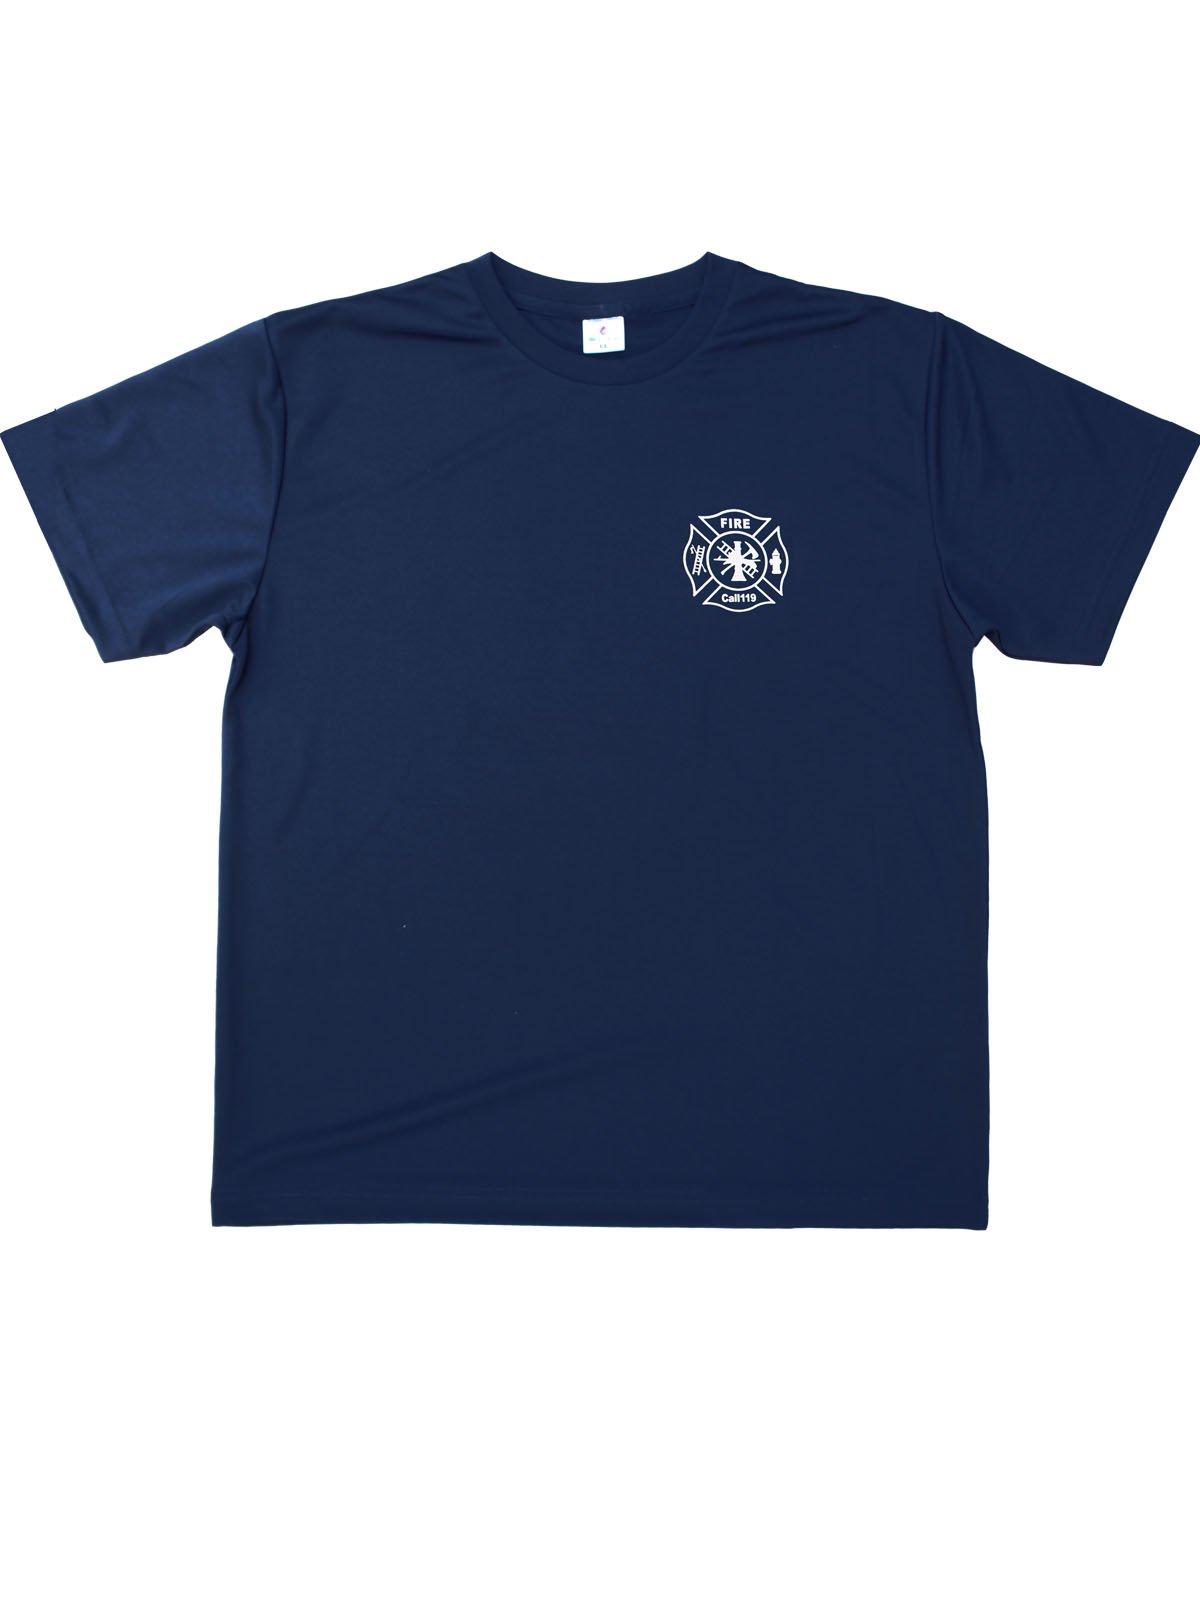 FIRE FIGHTER Call119 デザインTシャツ【画像3】